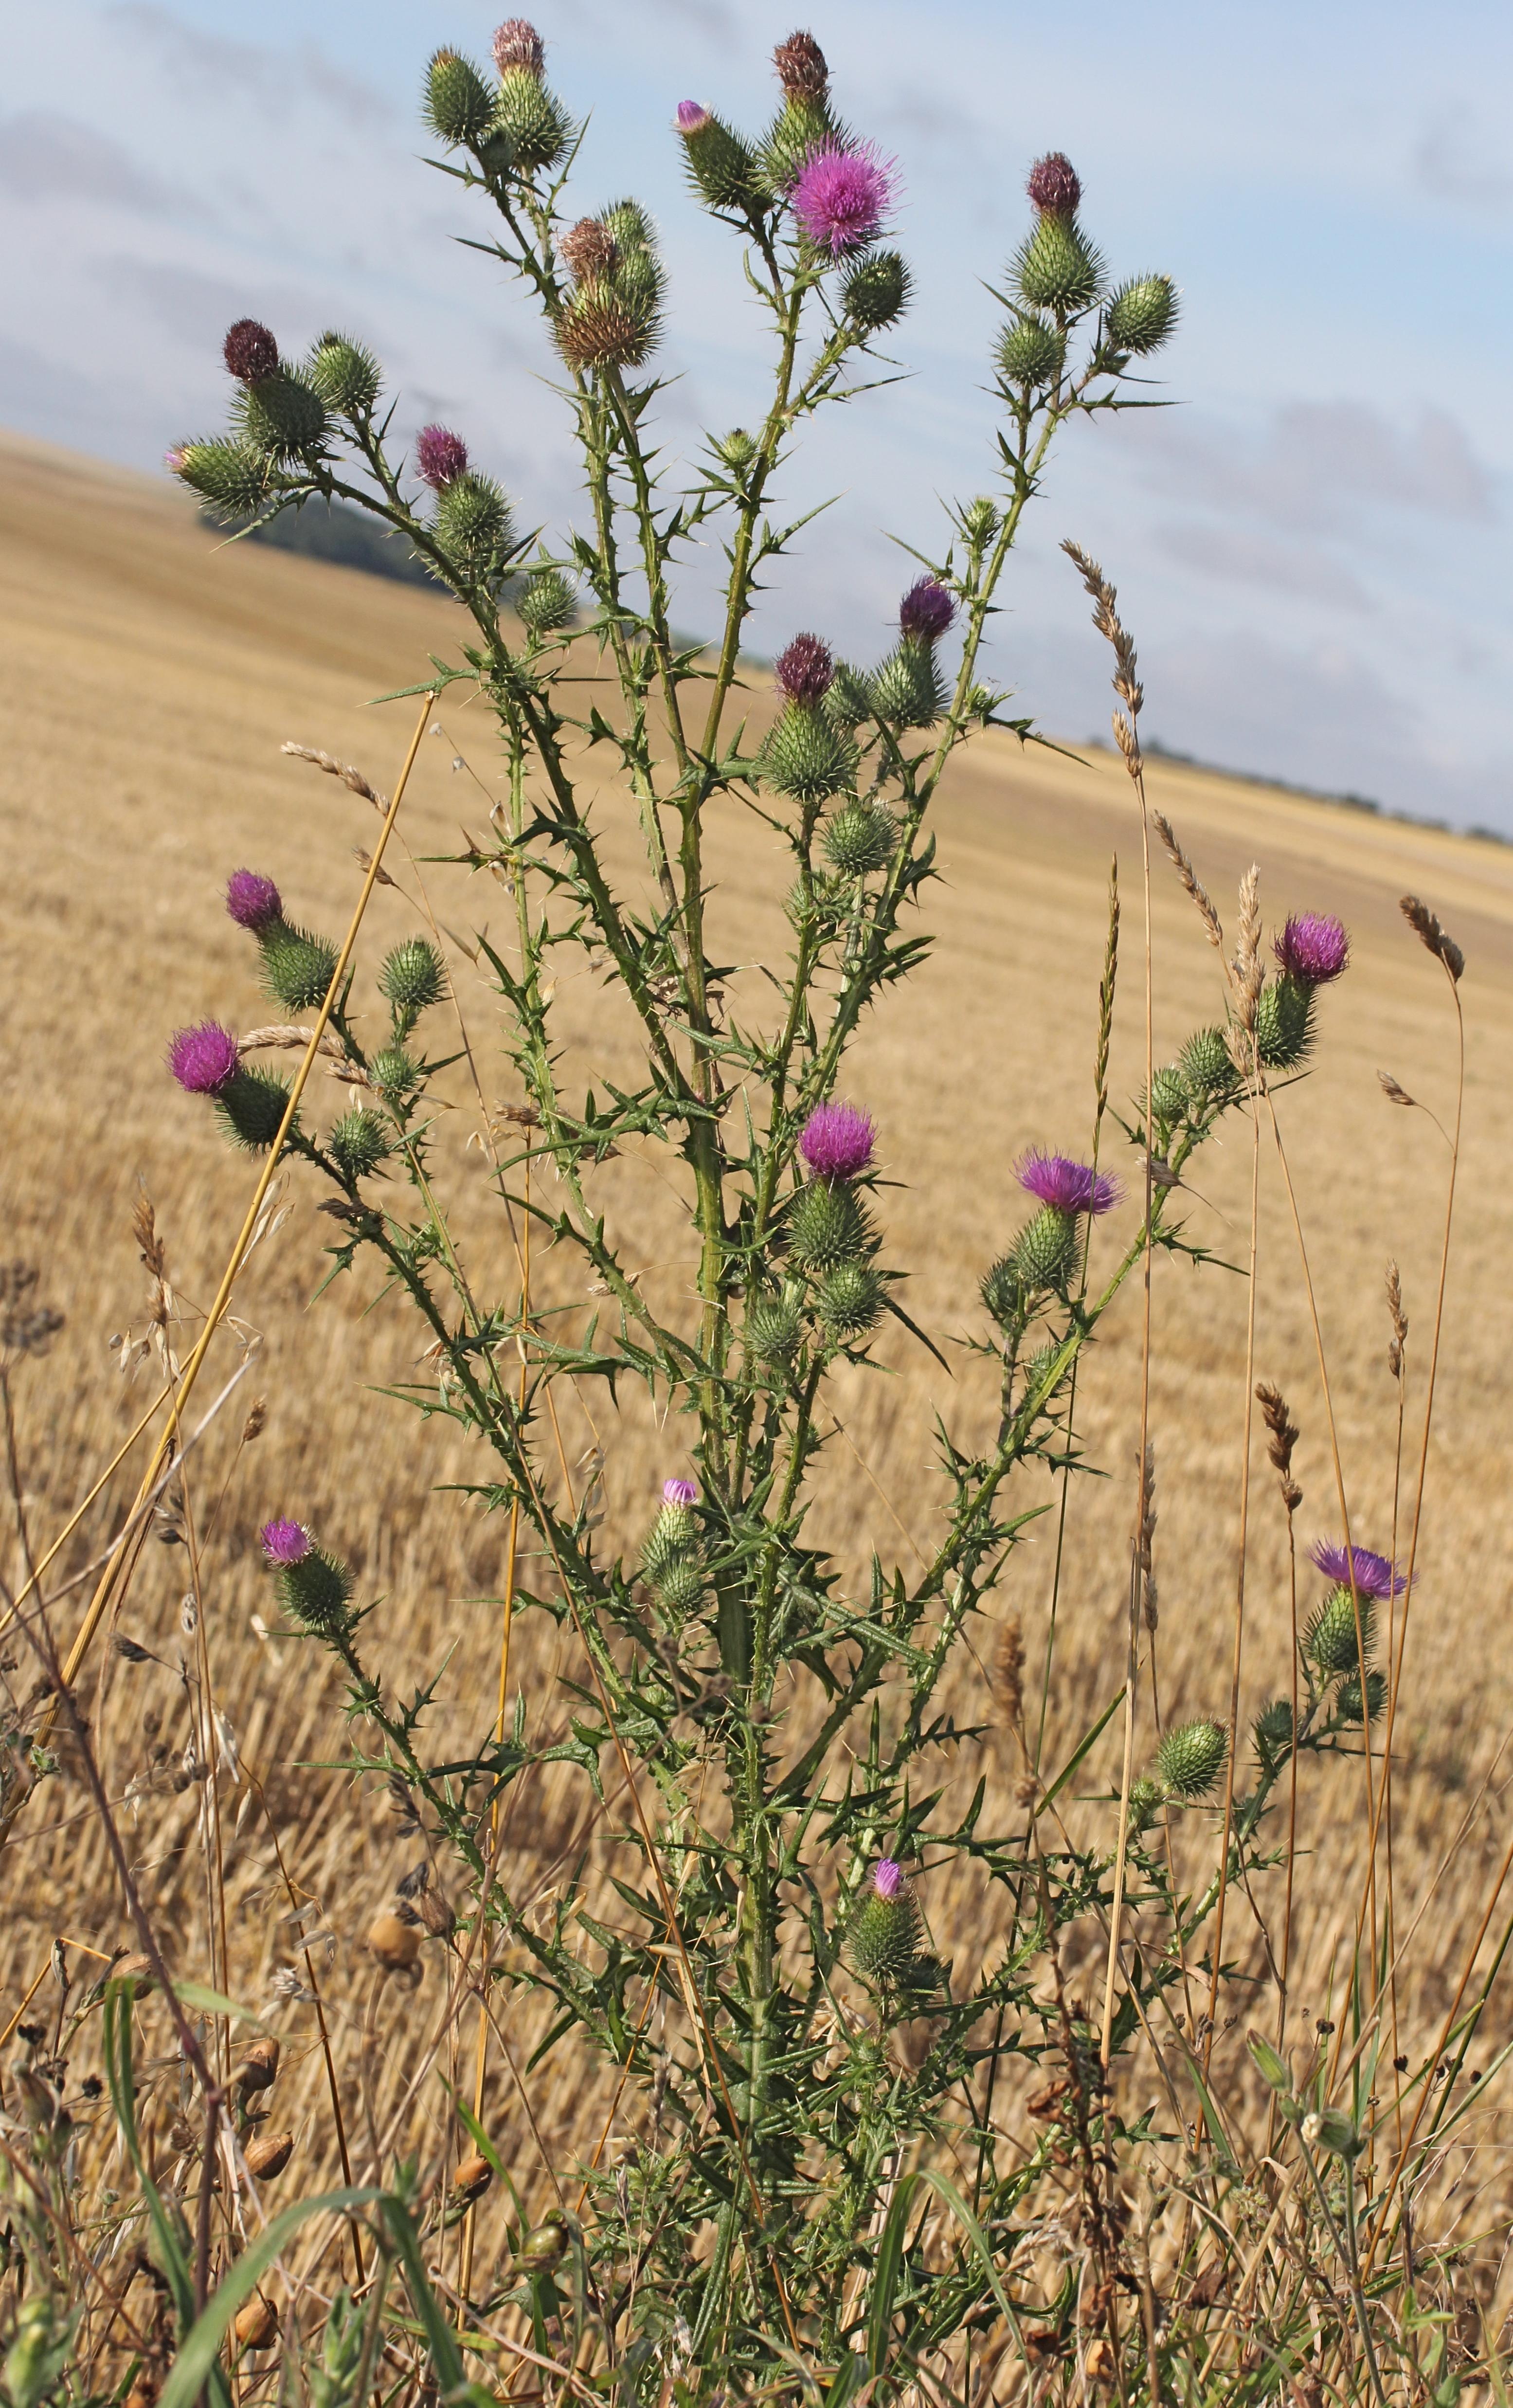 http://api.tela-botanica.org/img:000259078O.jpg